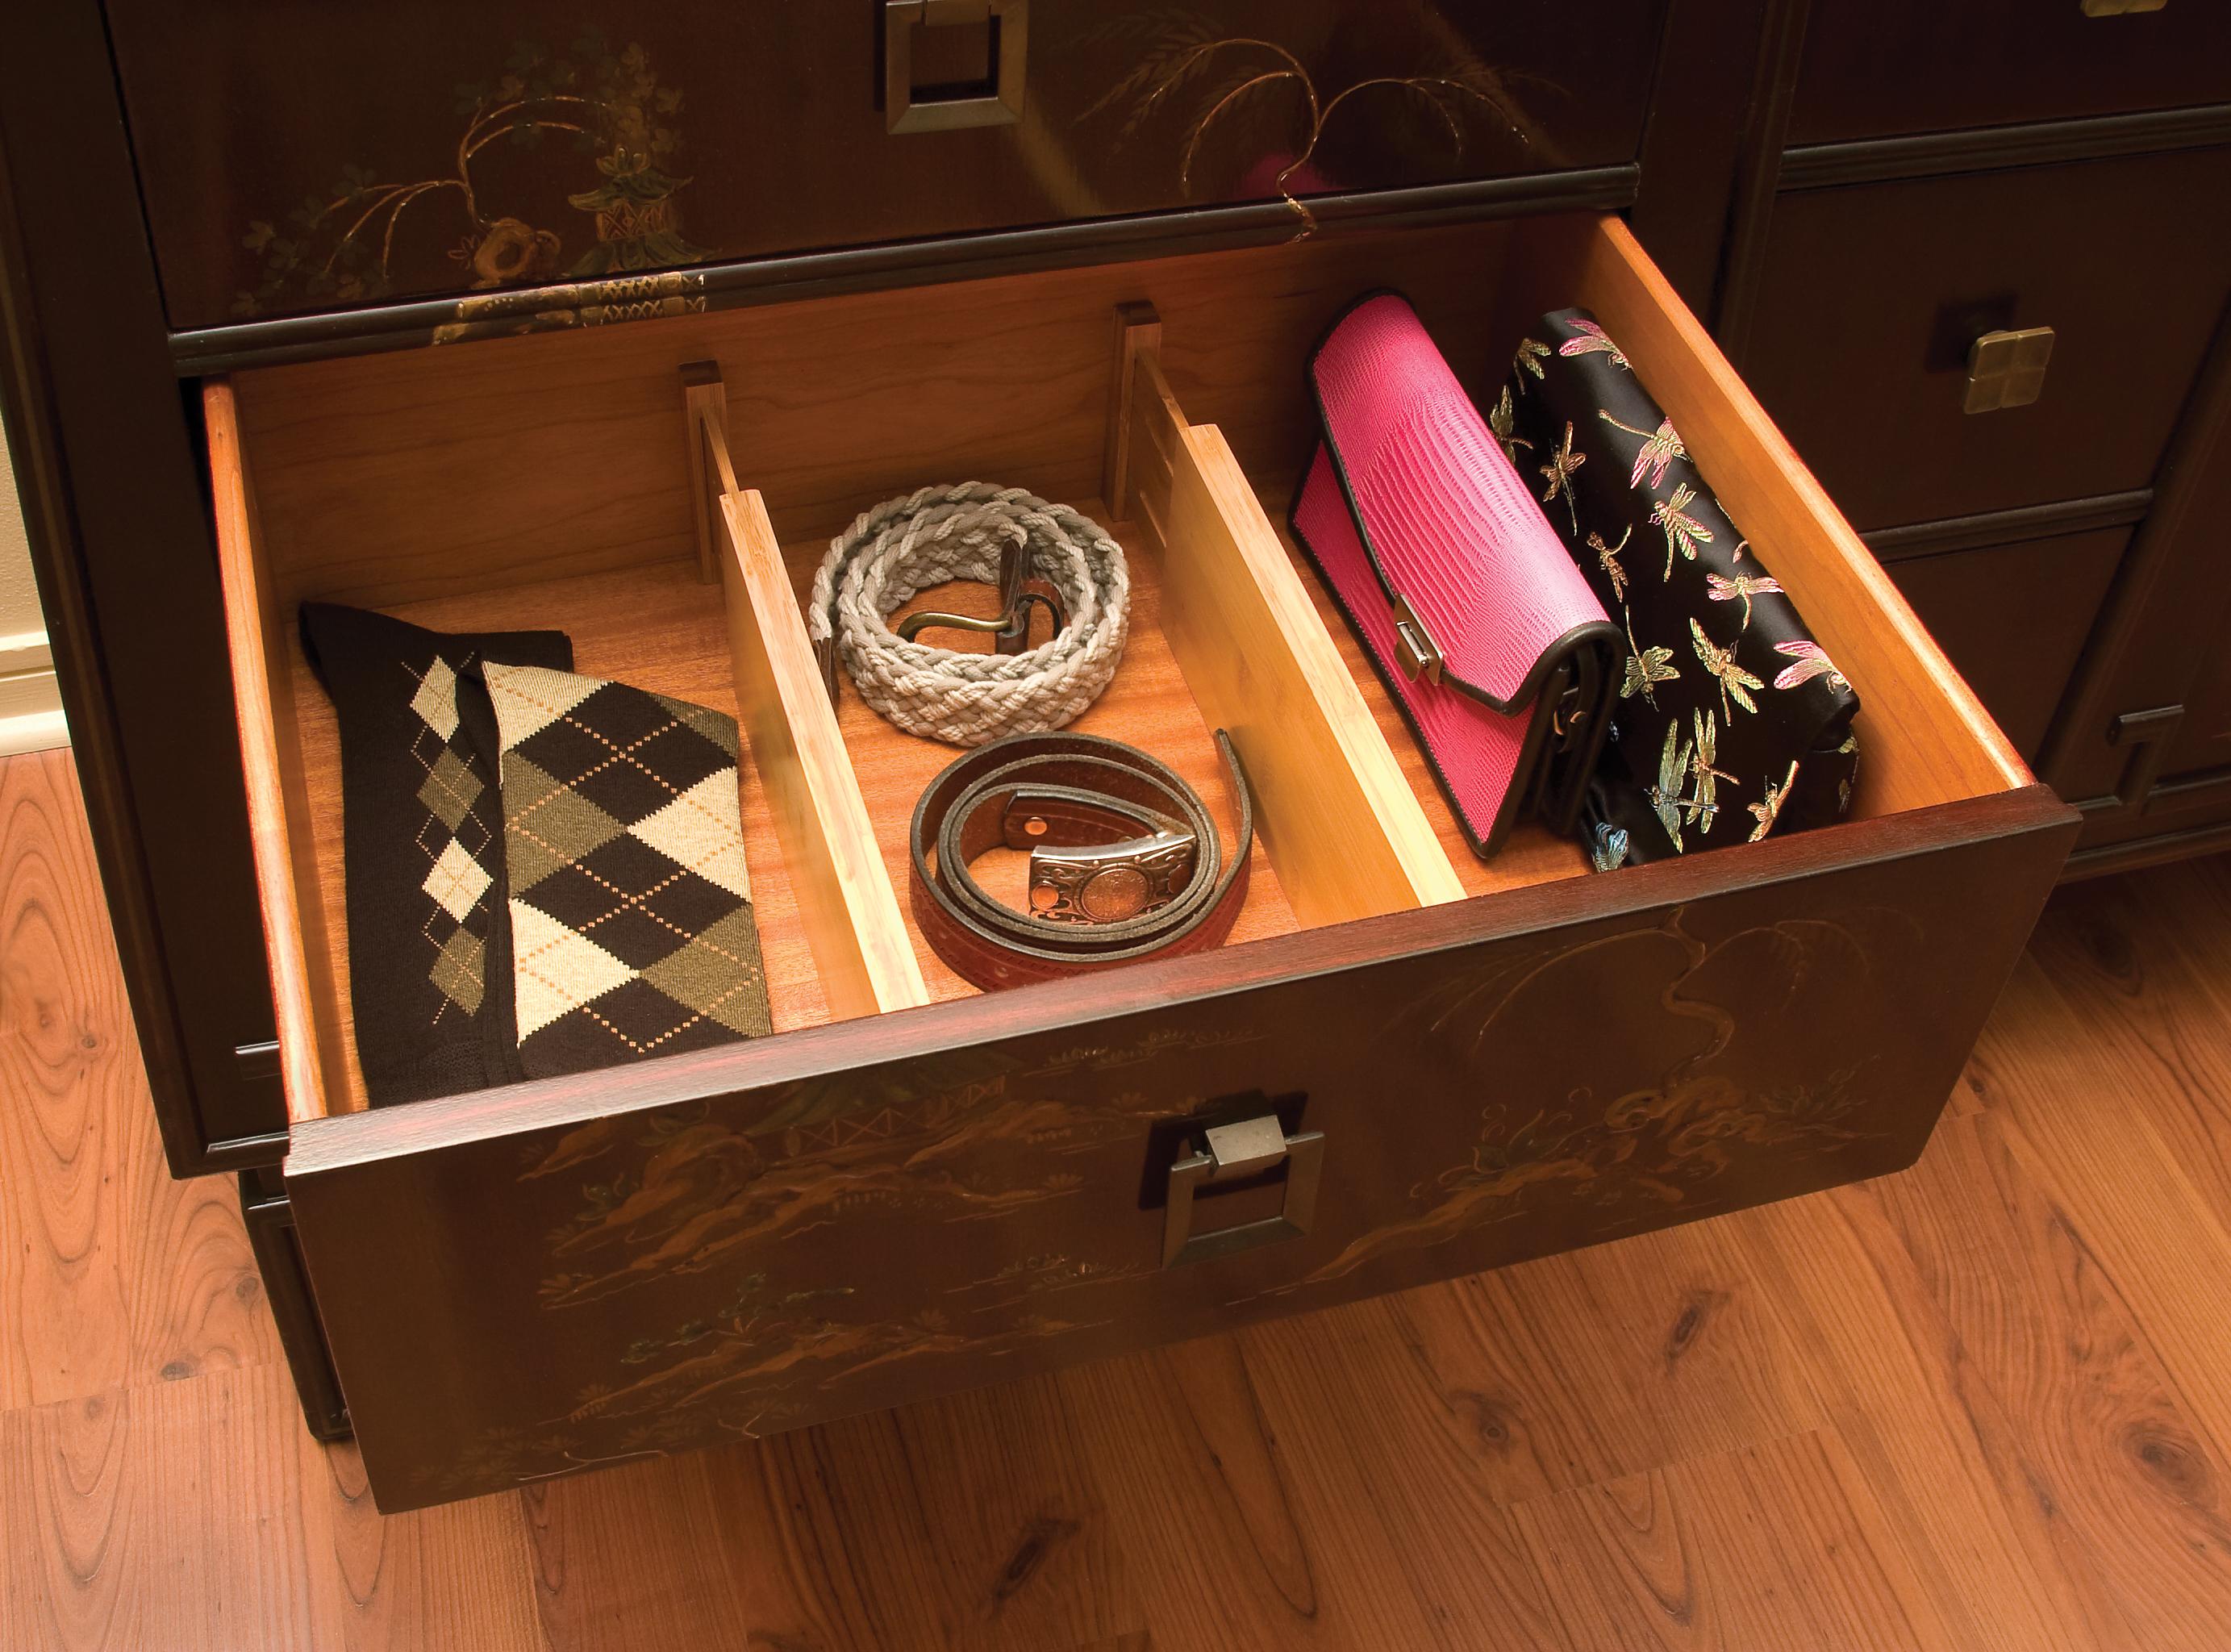 makeup inspiration pin ikea feat drawer alex organizers totalmakeupaddict dresser storage dividers unit